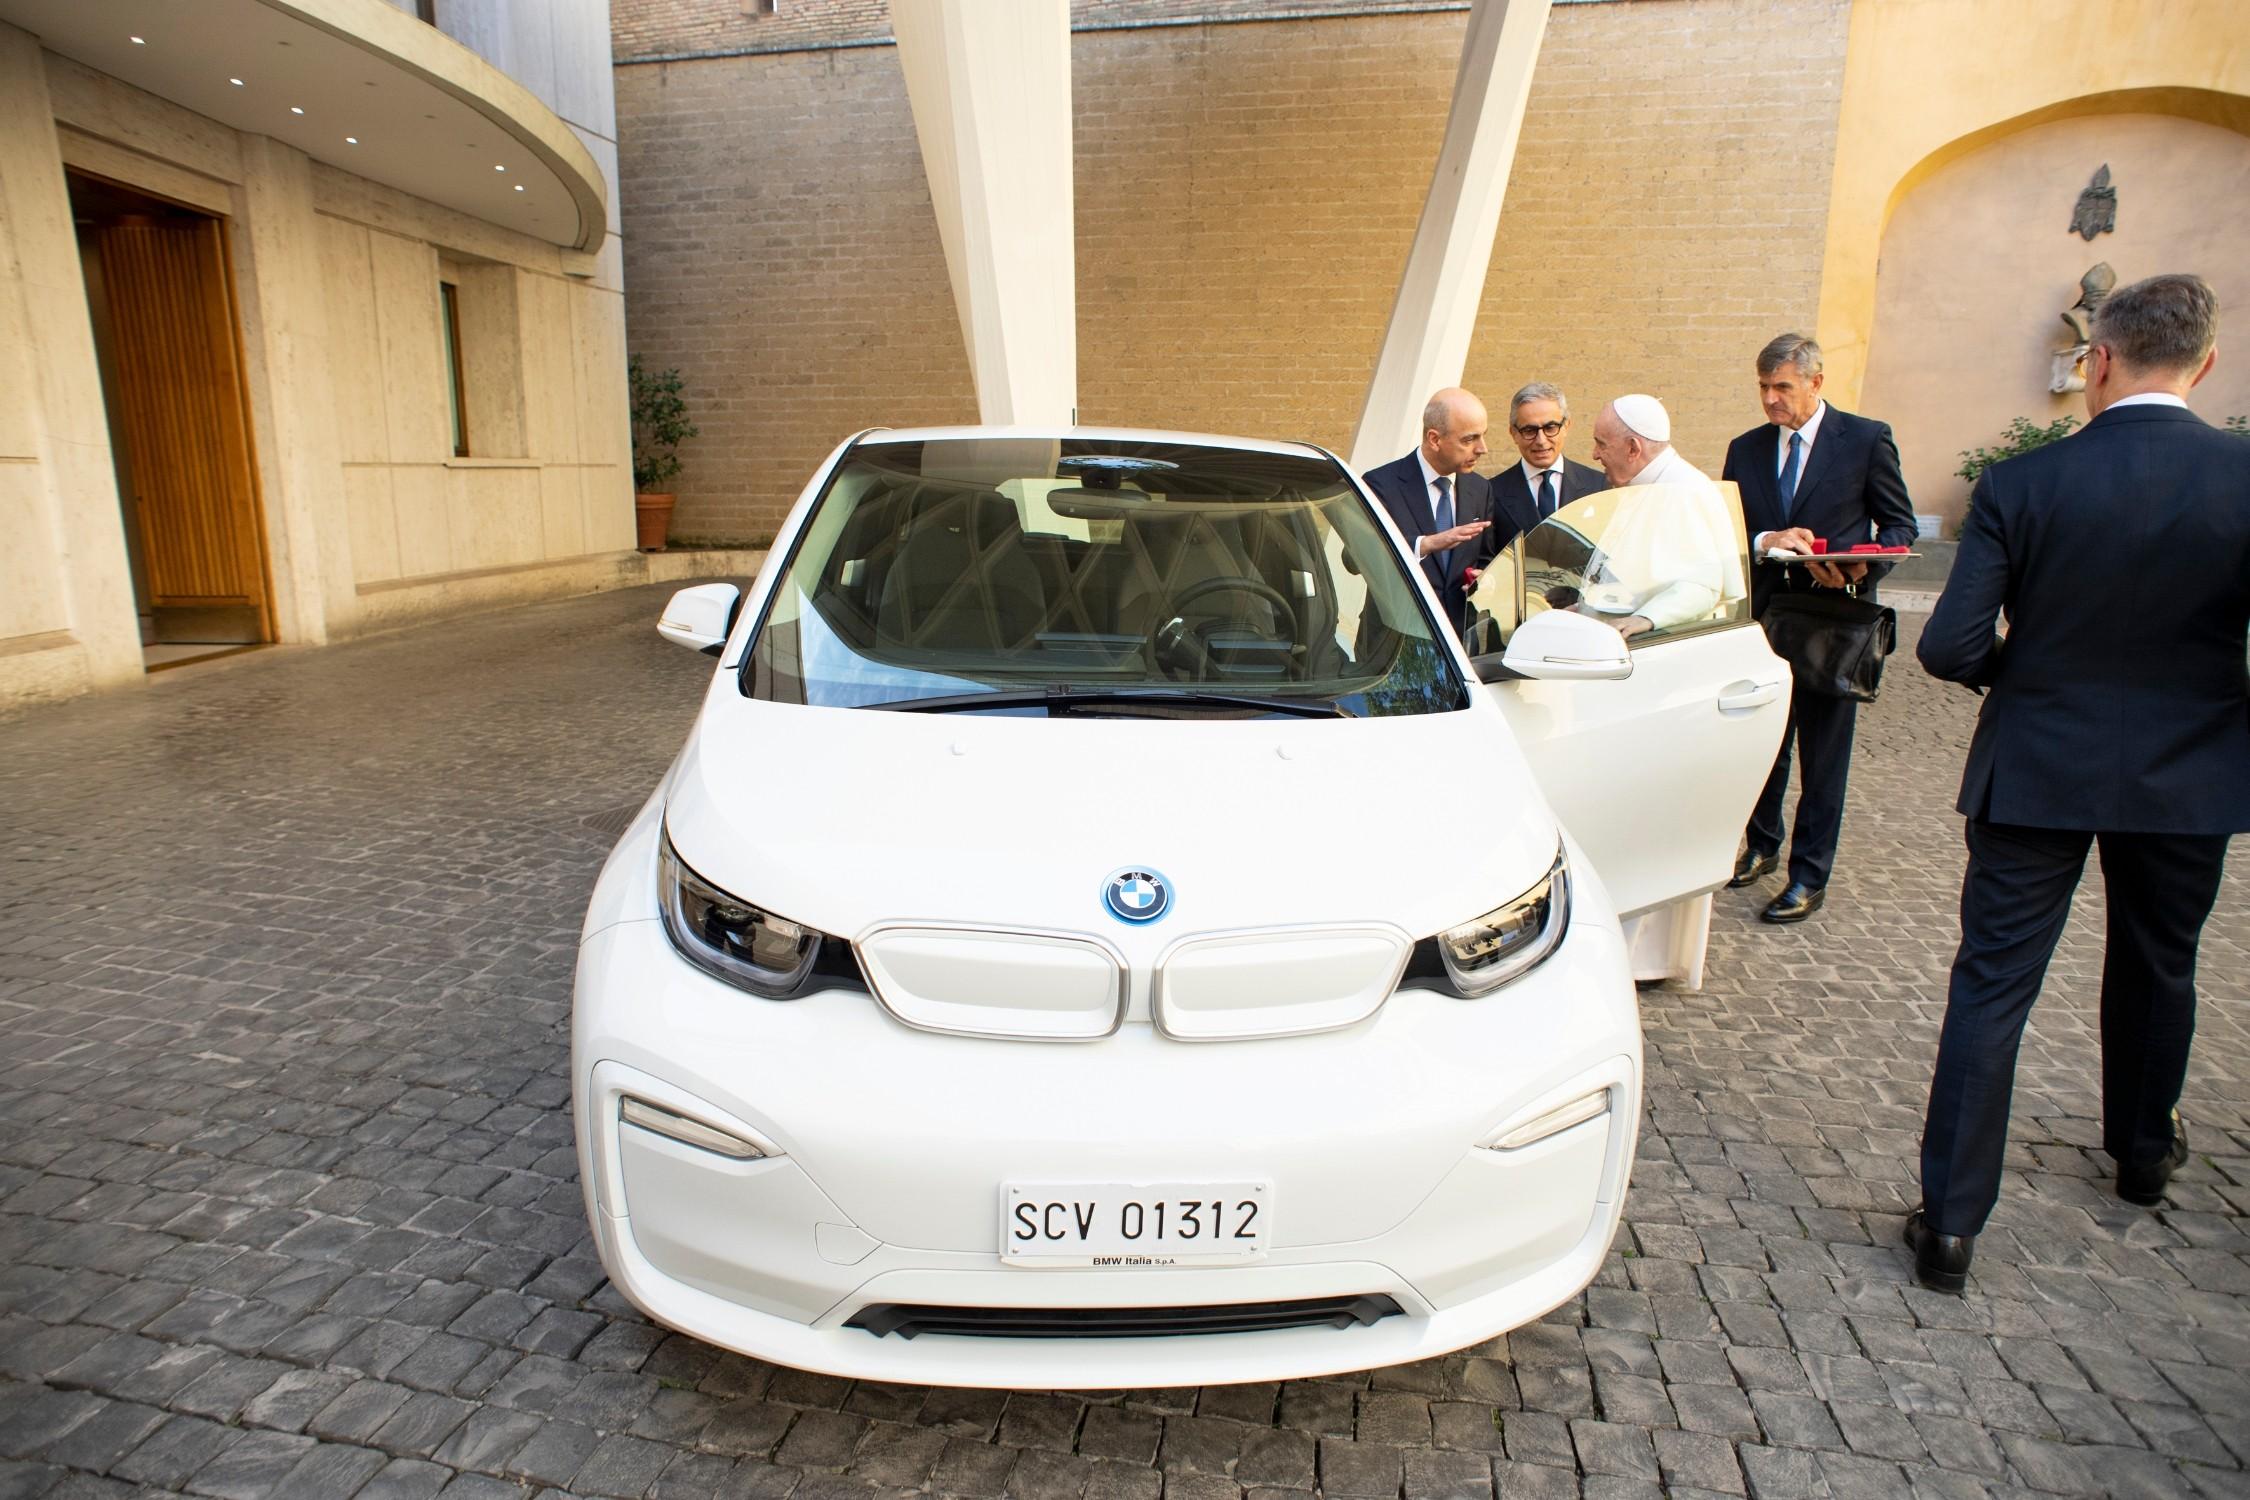 BMW ha donato una i3 al Papa.